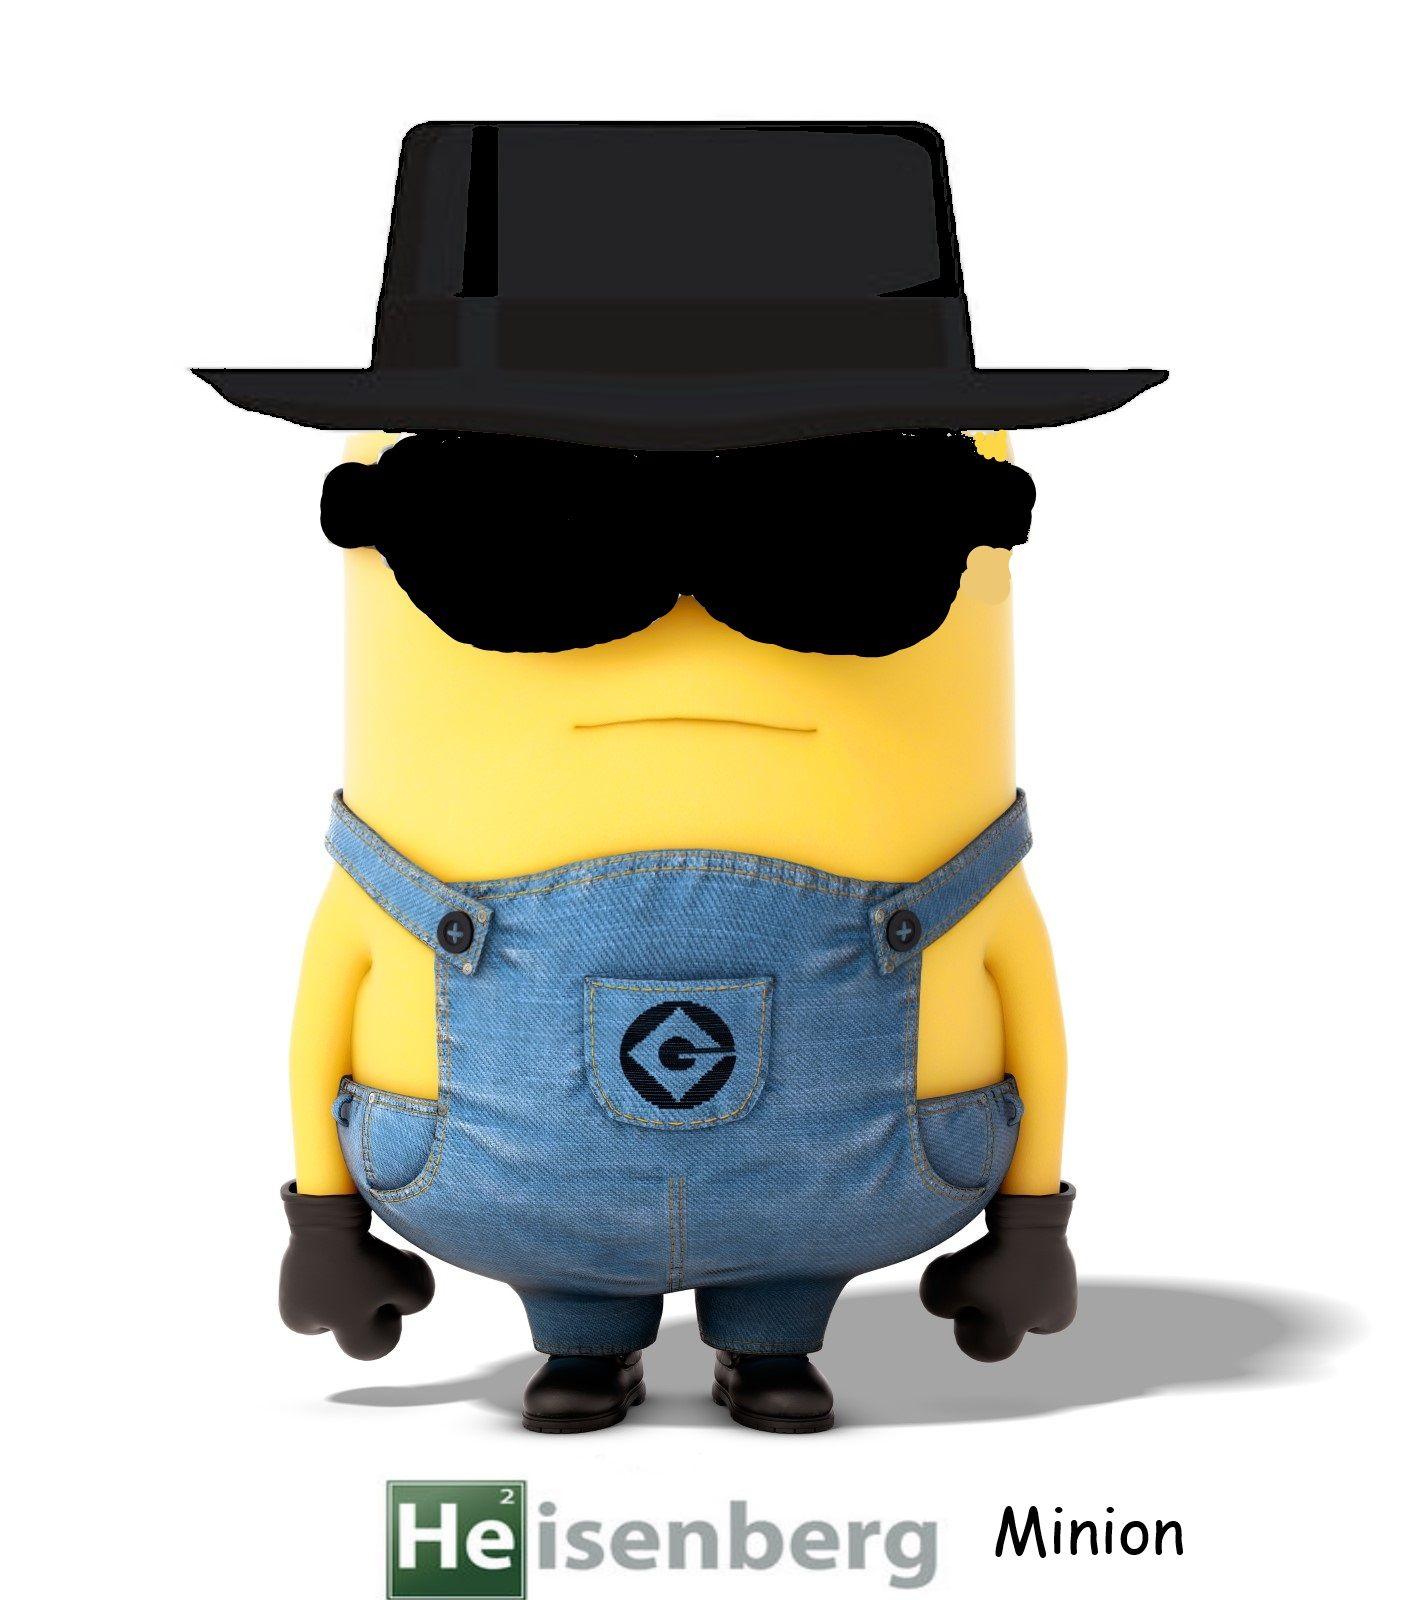 Heisenberg Minion